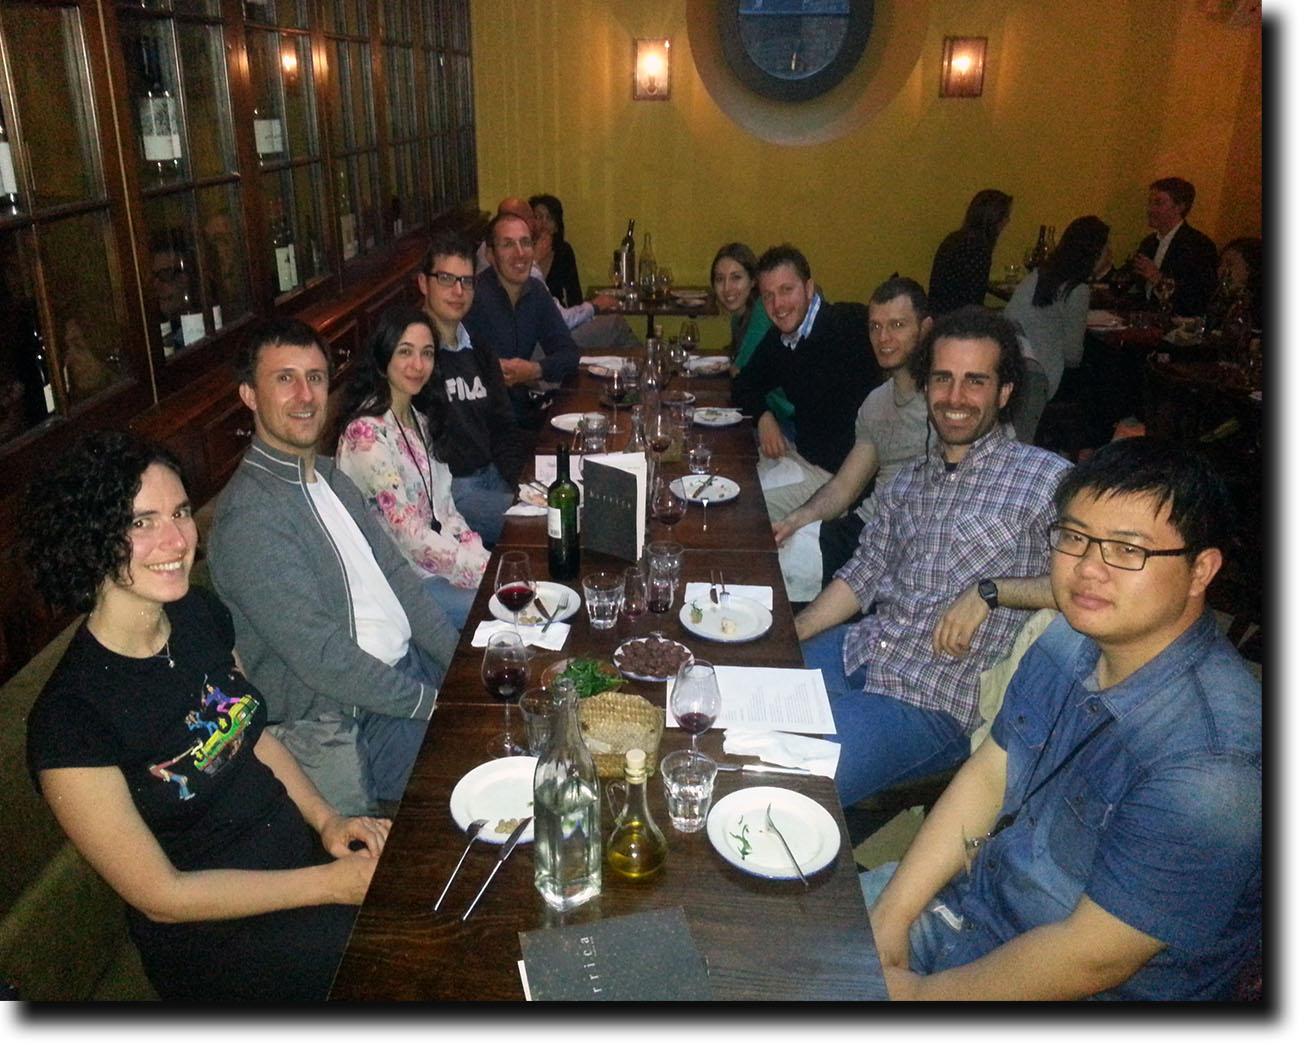 Left to right: Philipp, Chiara, Steve, Gabriella, Martin, Gabriele, Wei, Ji, Yasmine